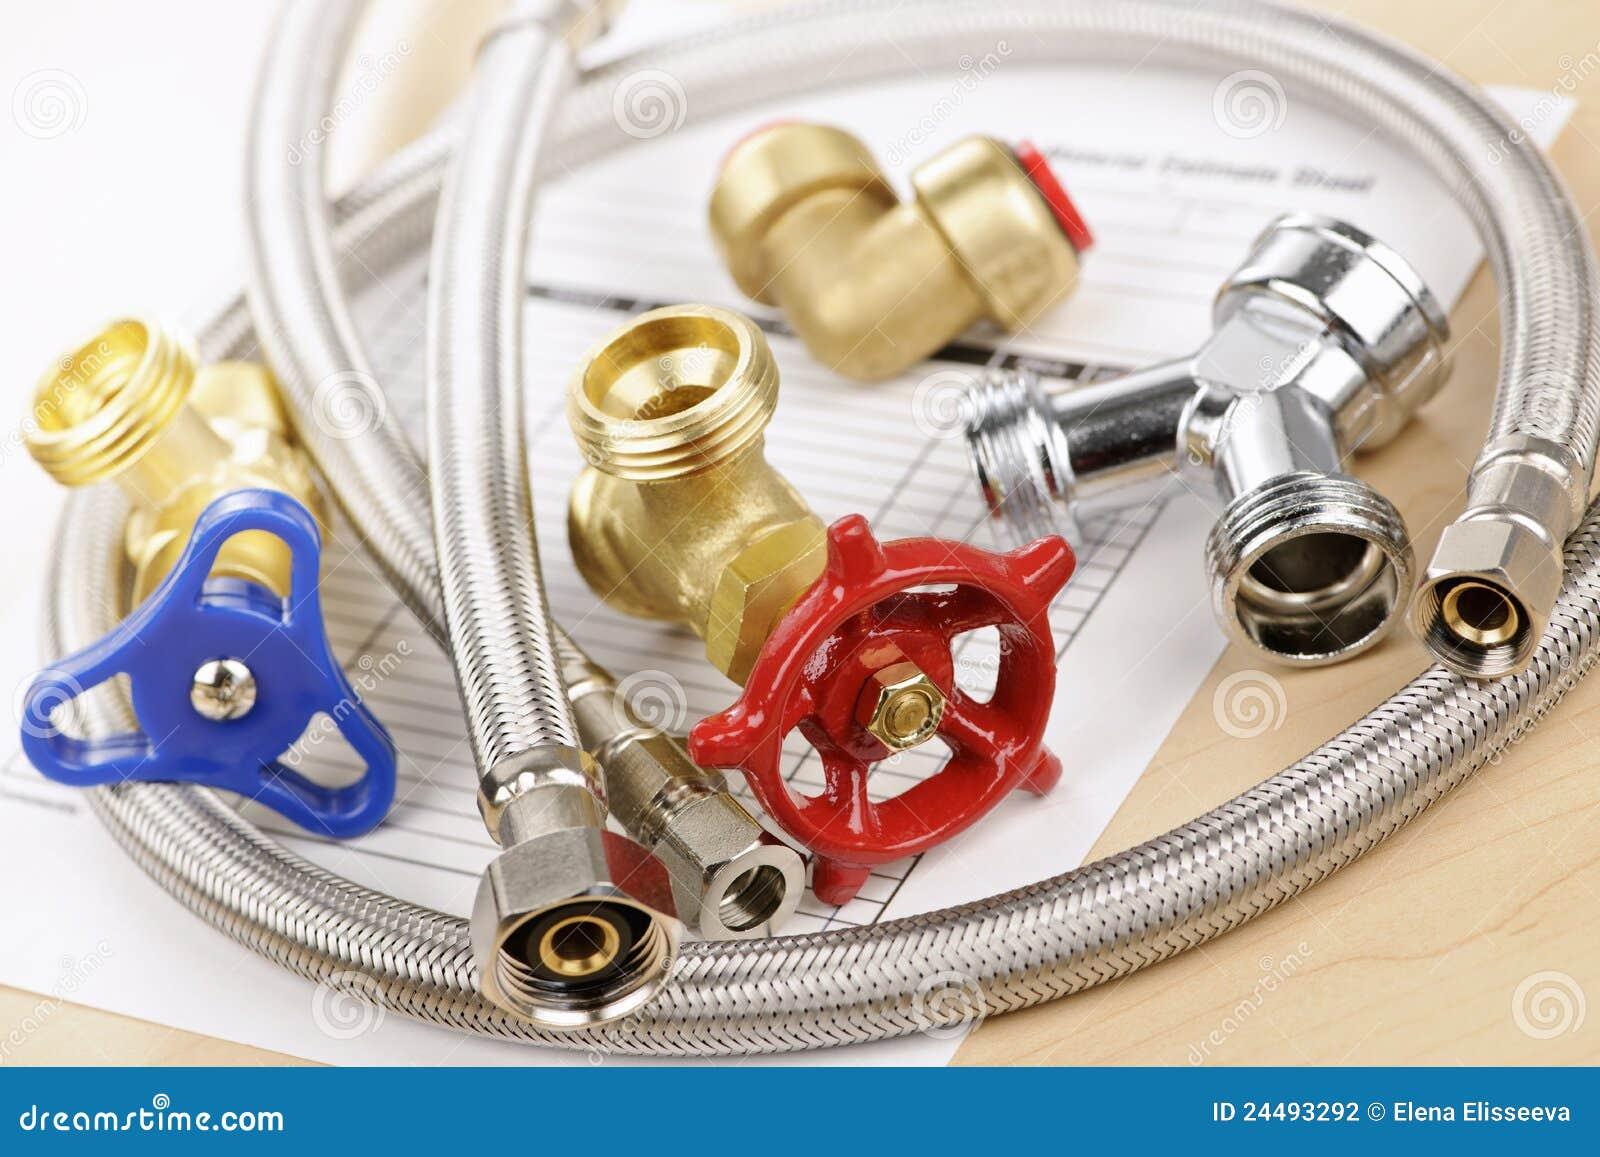 Plumbing parts stock photography image